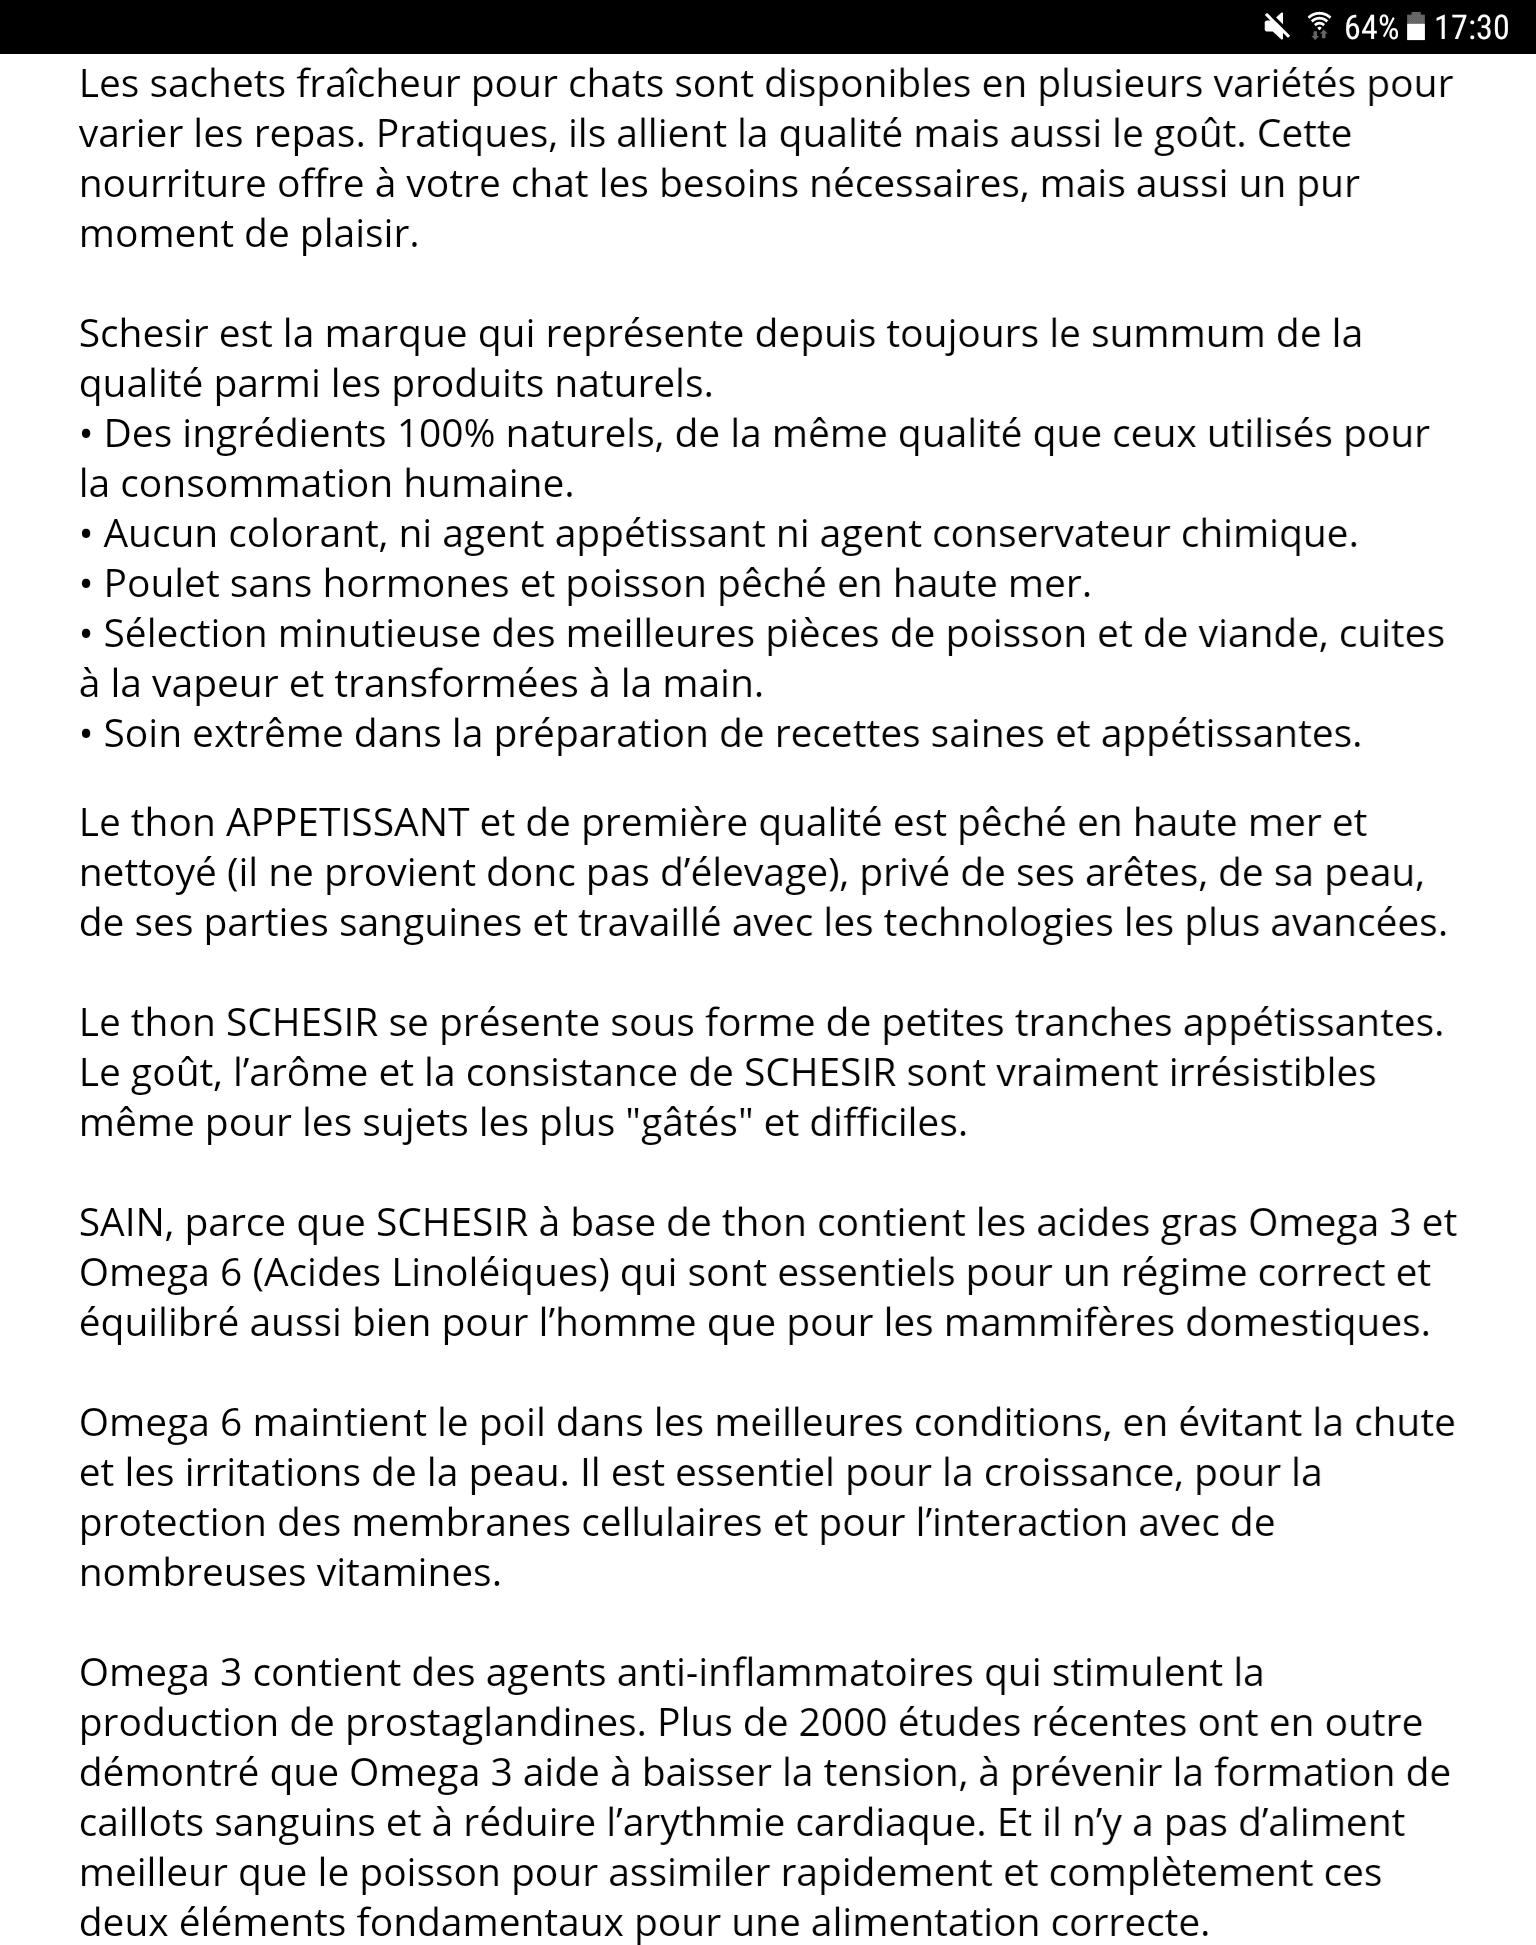 Sachet Faîcheur Shésir Chat Thon Saumon